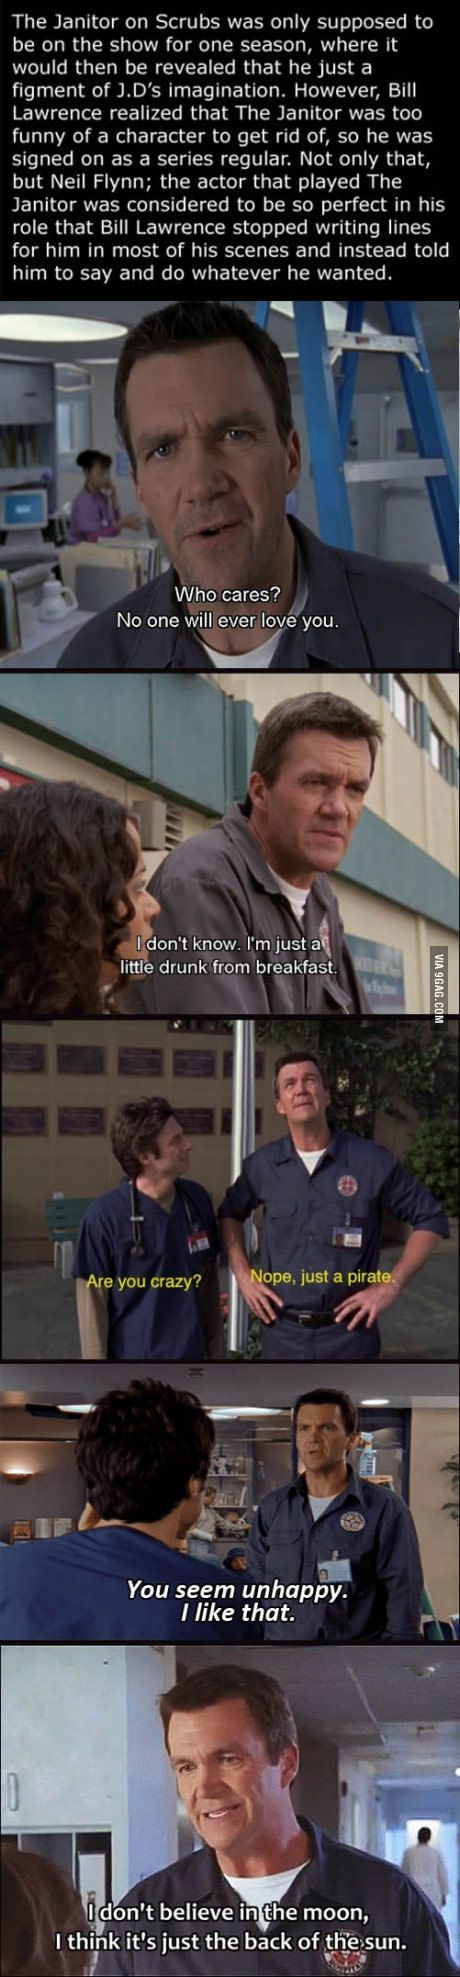 Neil Flynn (Janitor) on Scrubs